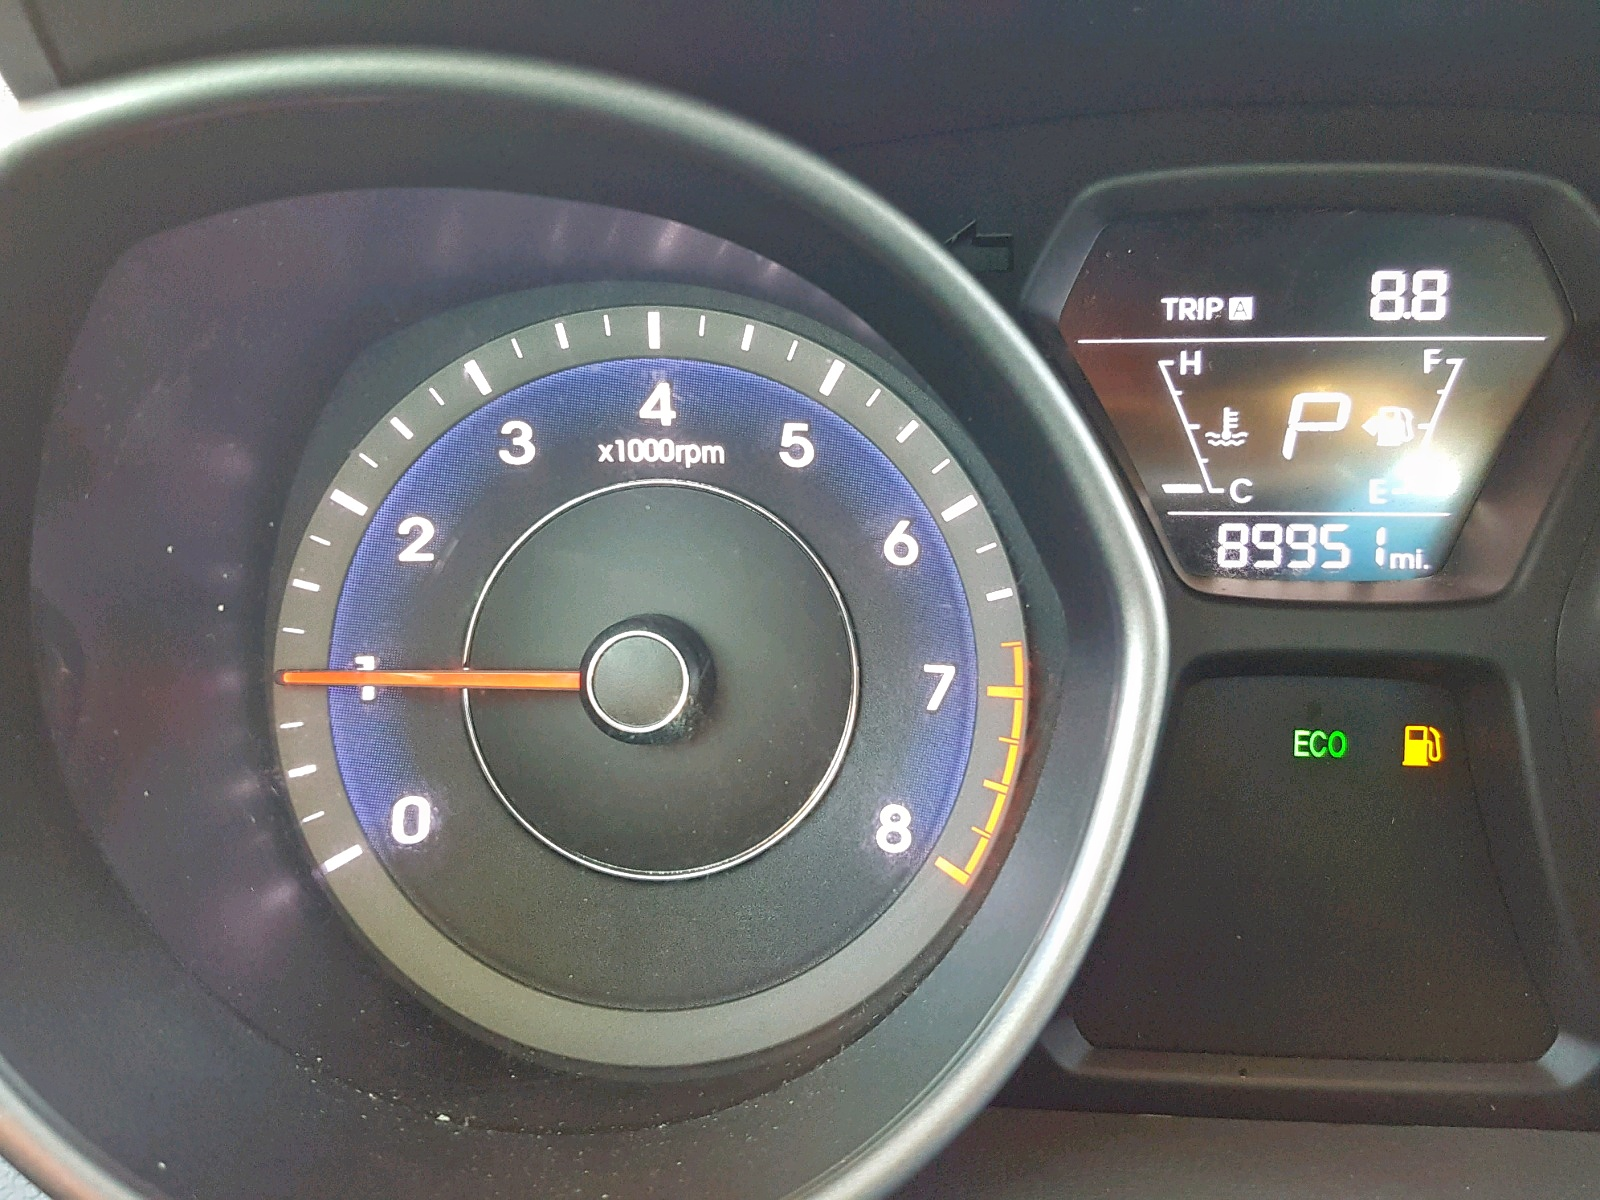 2016 Hyundai Elantra Se 1.8L front view